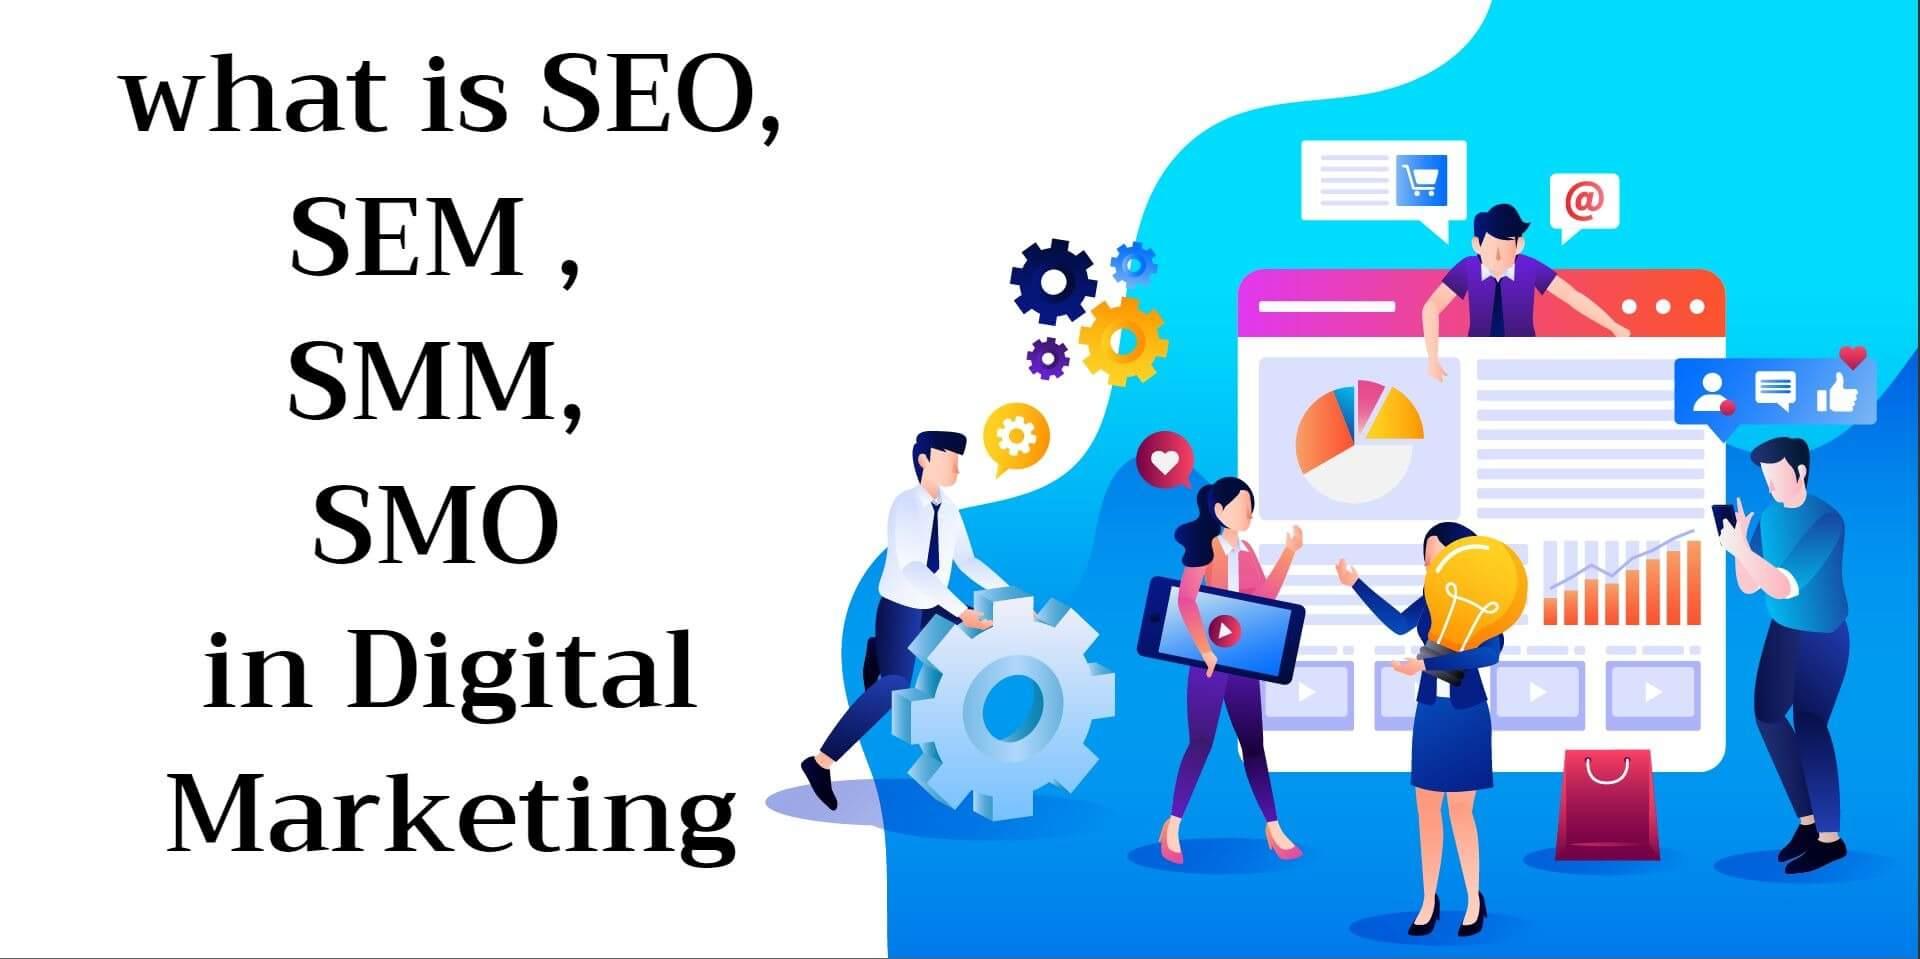 What is SEM, SMM, SEO, SMO in Digital Marketing